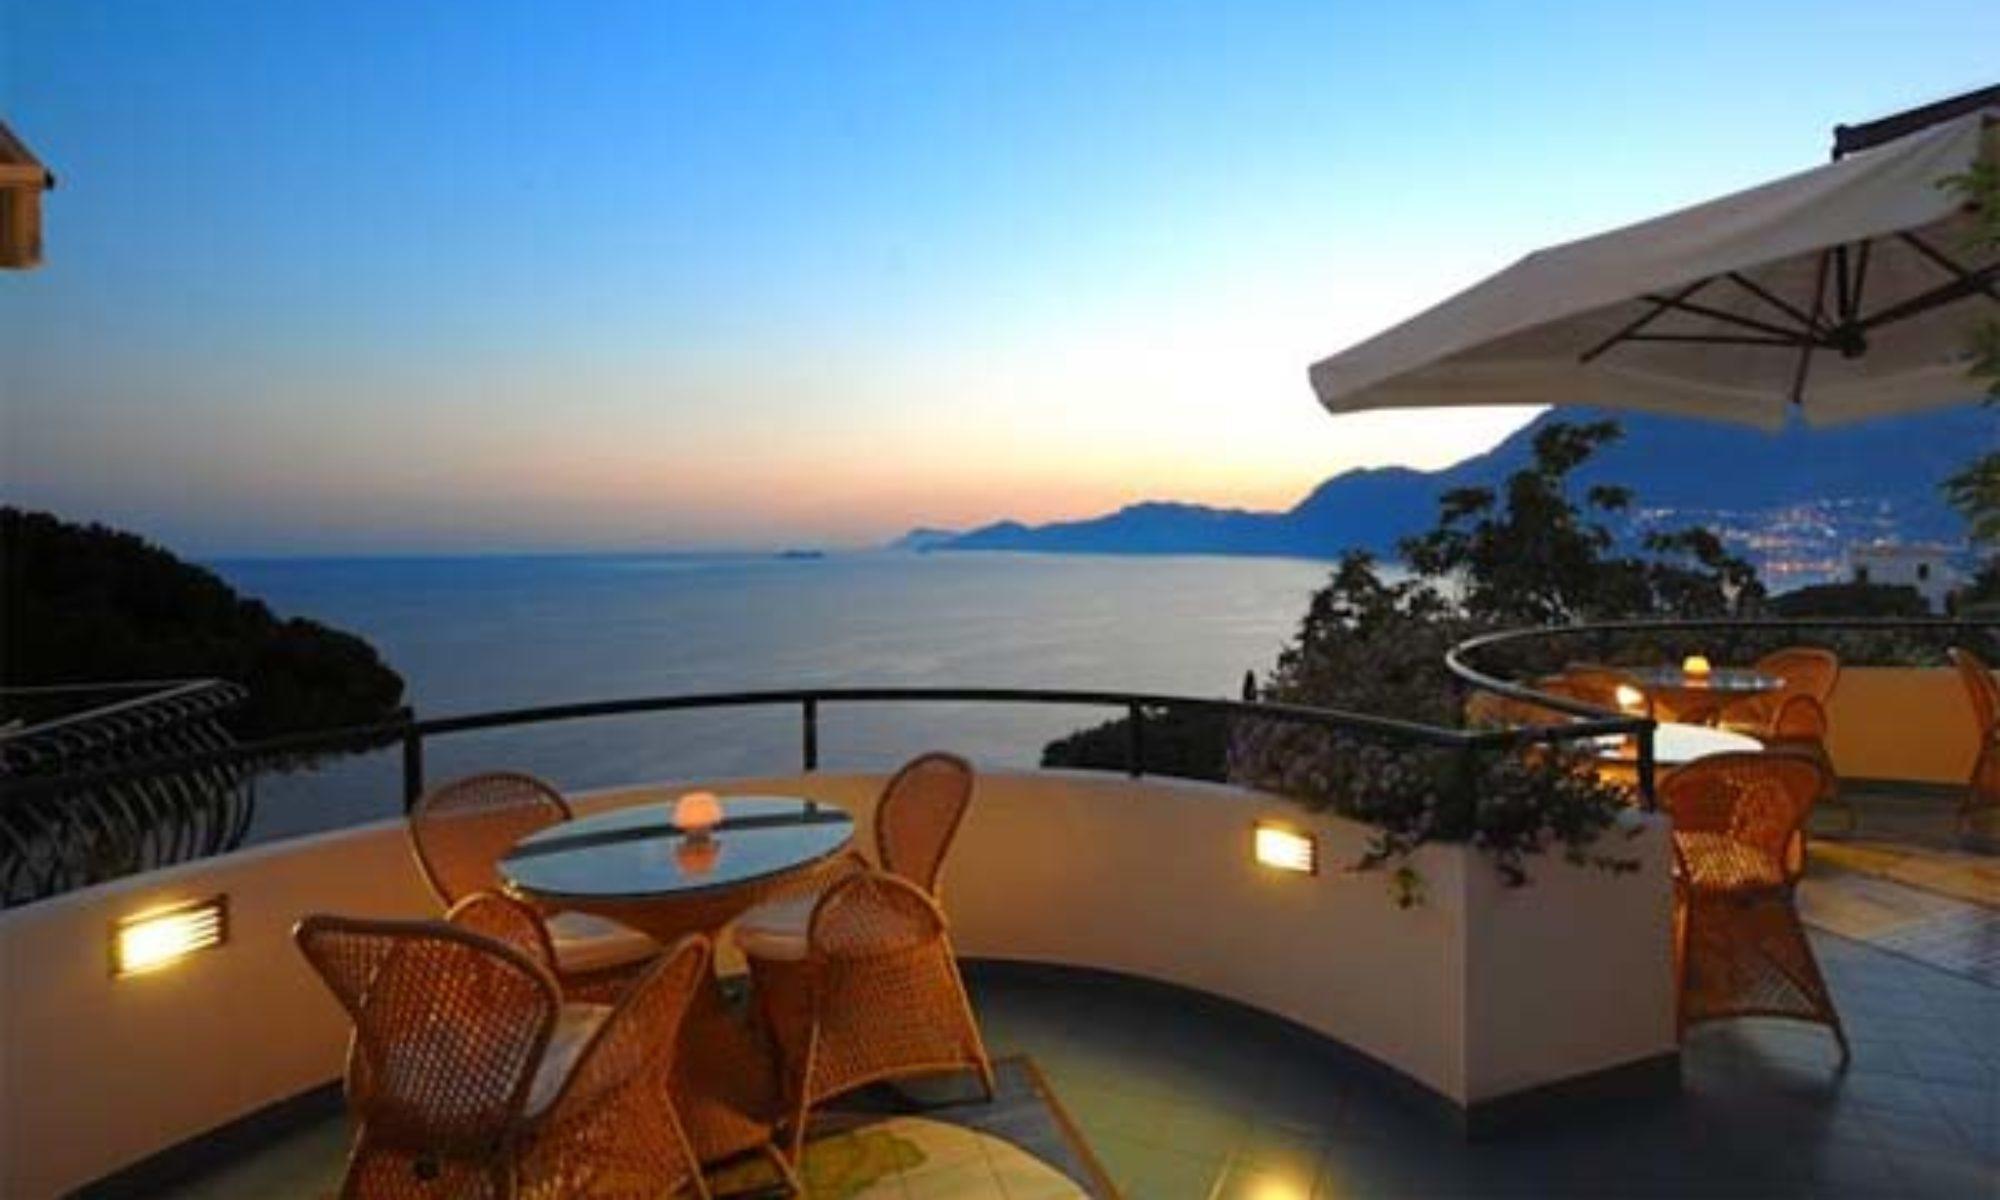 Hotel Isola Elba